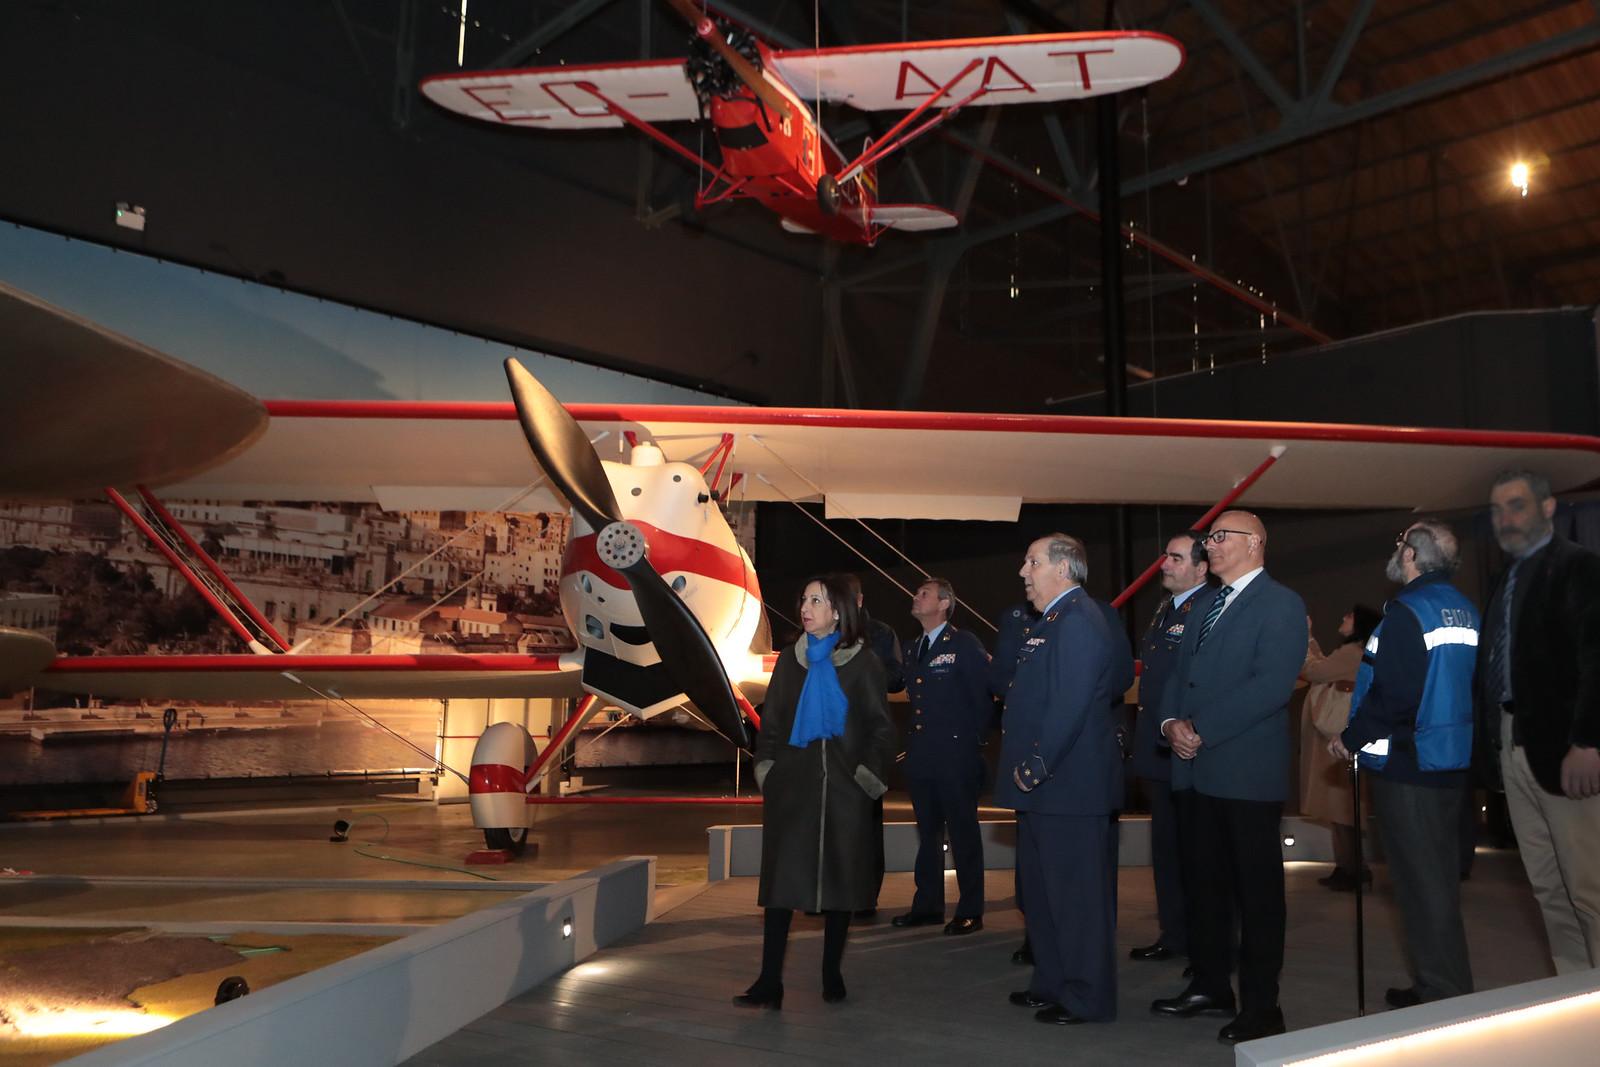 La ministra de Defensa en el hangar 1 del Museo del Aire